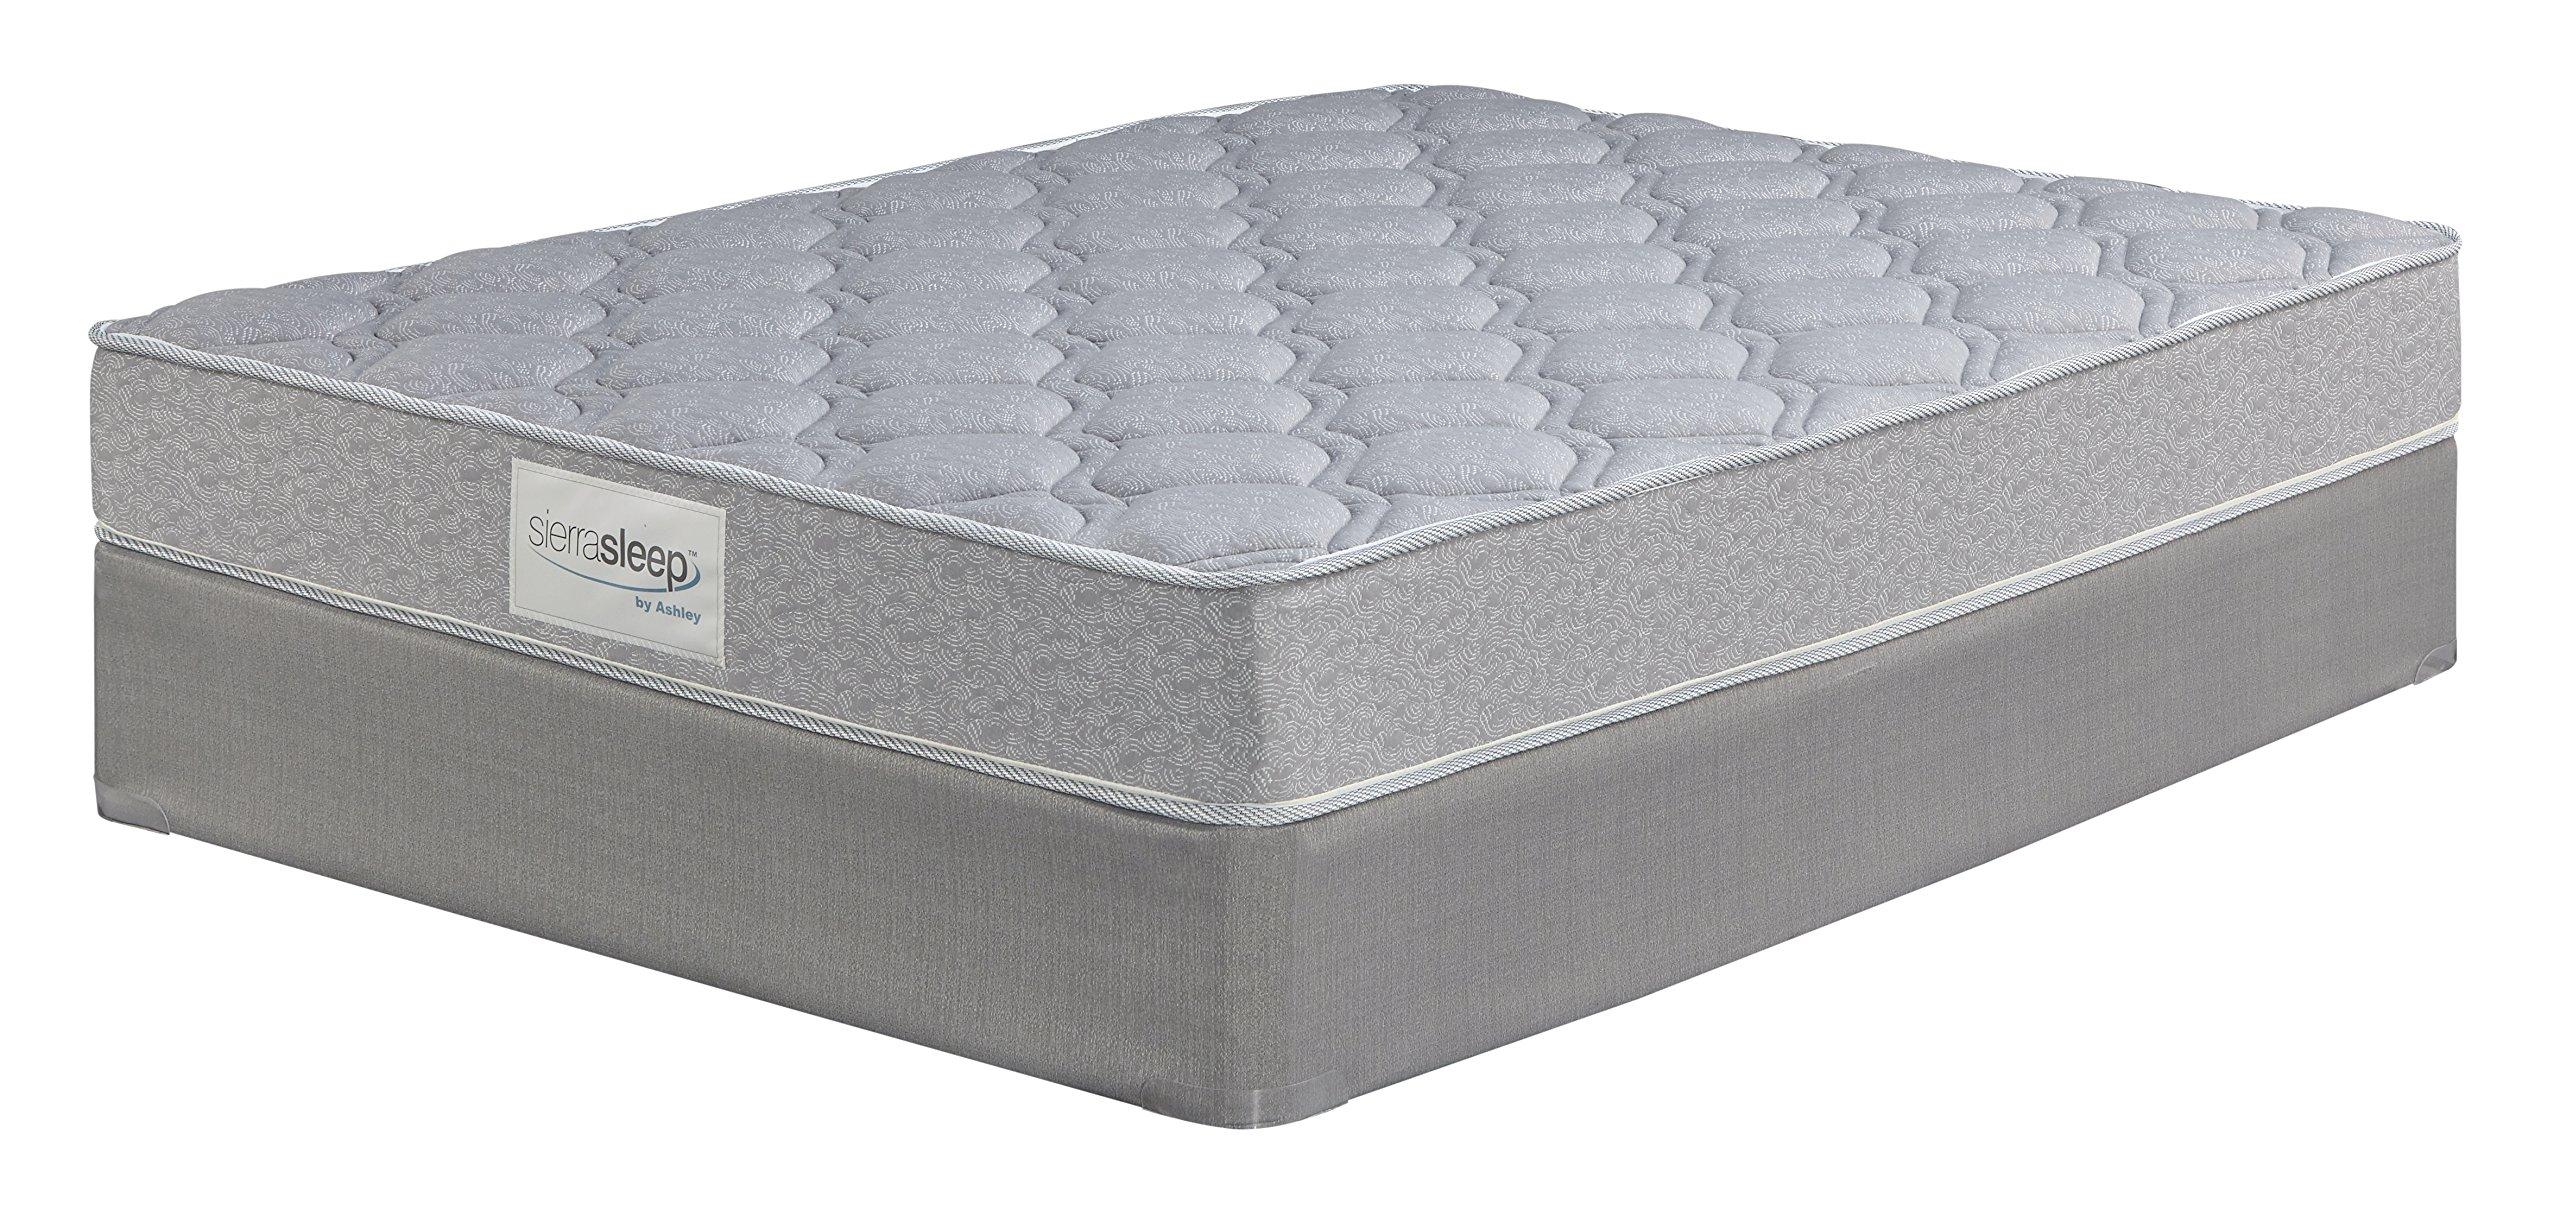 Ashley Furniture Signature Design - Sierra Sleep - Silver Ltd. Firm Tight Top Mattress - Traditional Twin Size Mattress - White